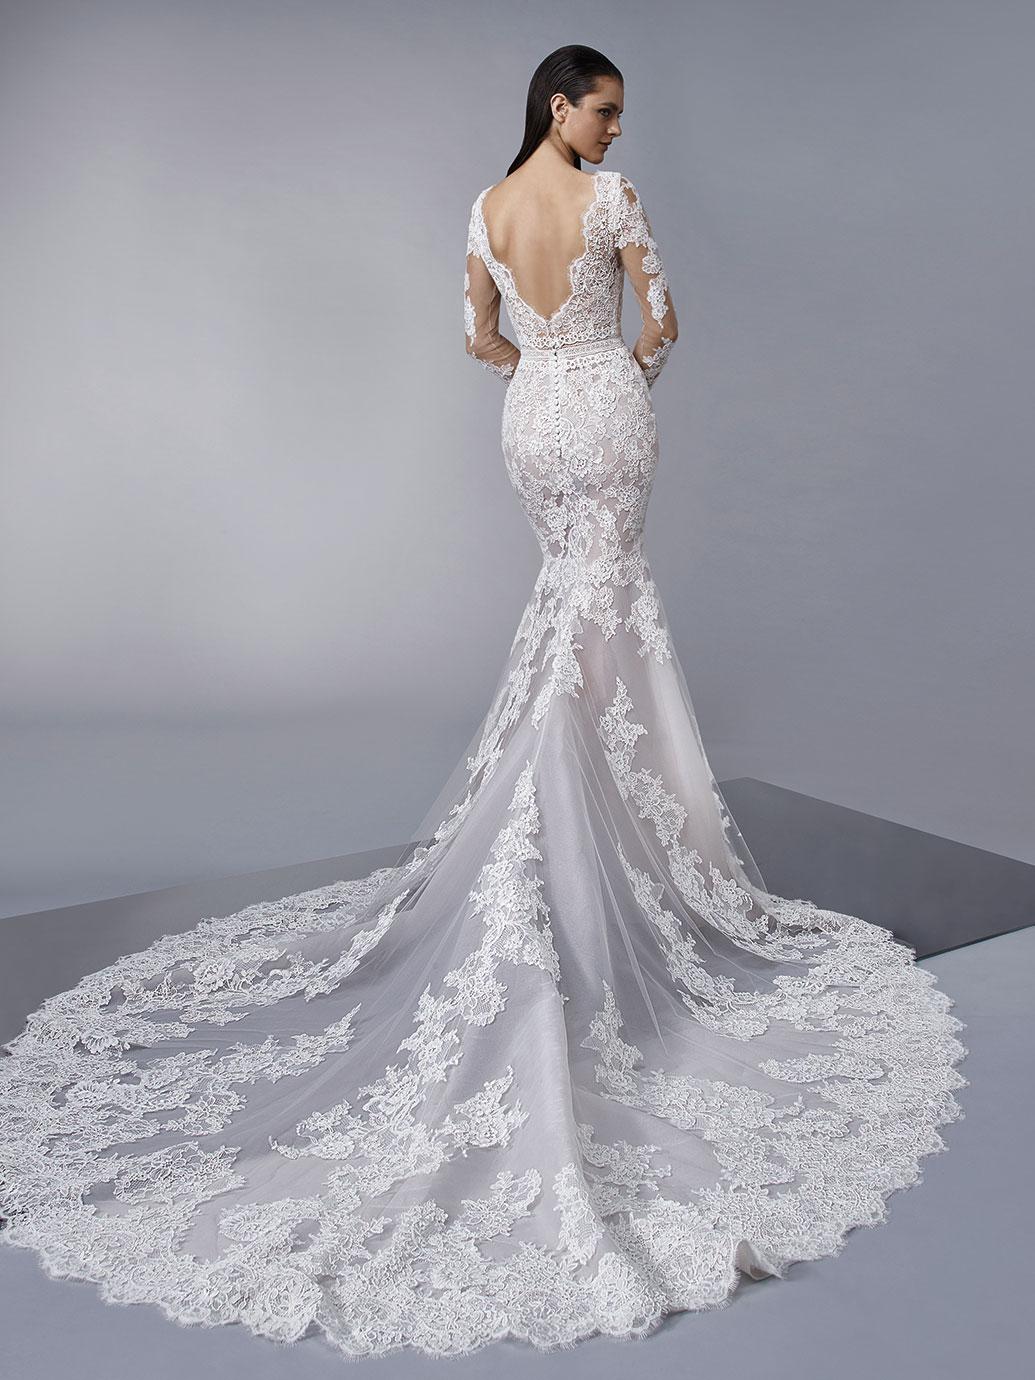 1b6797d9185 Enzoani Wedding Dress MT0530 - Toronto Bridal Gown